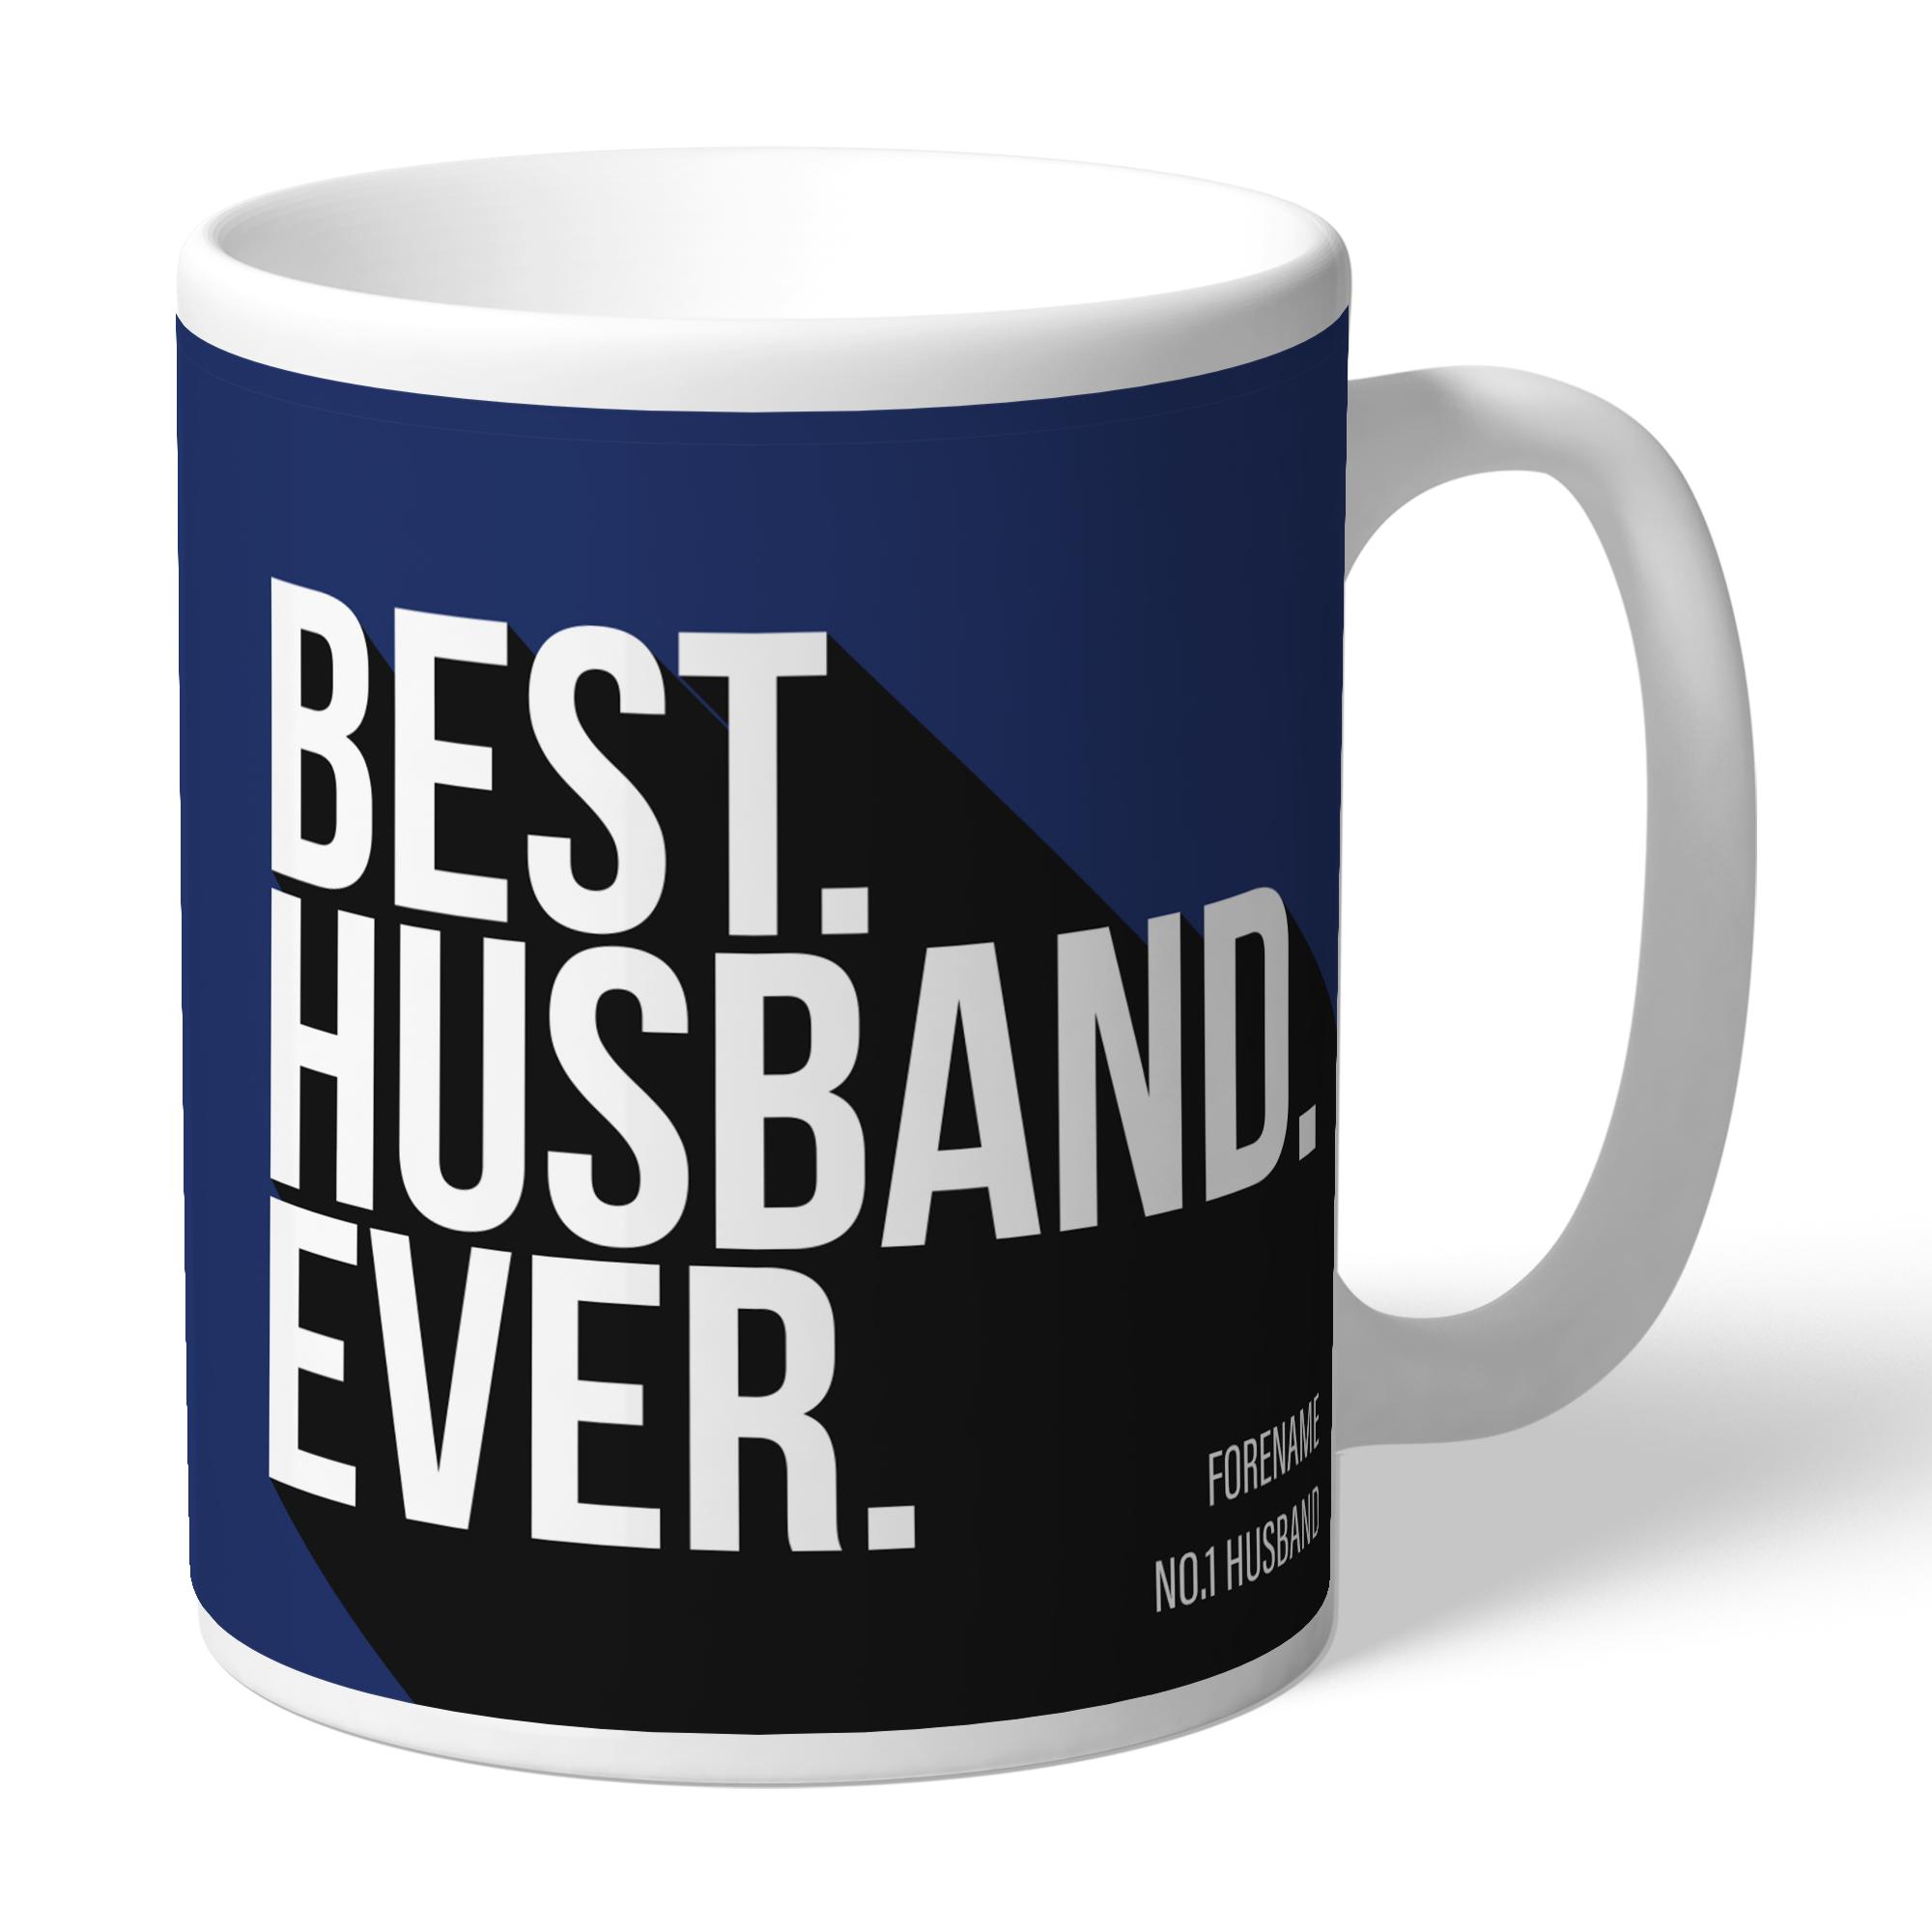 West Bromwich Albion FC Best Husband Ever Mug